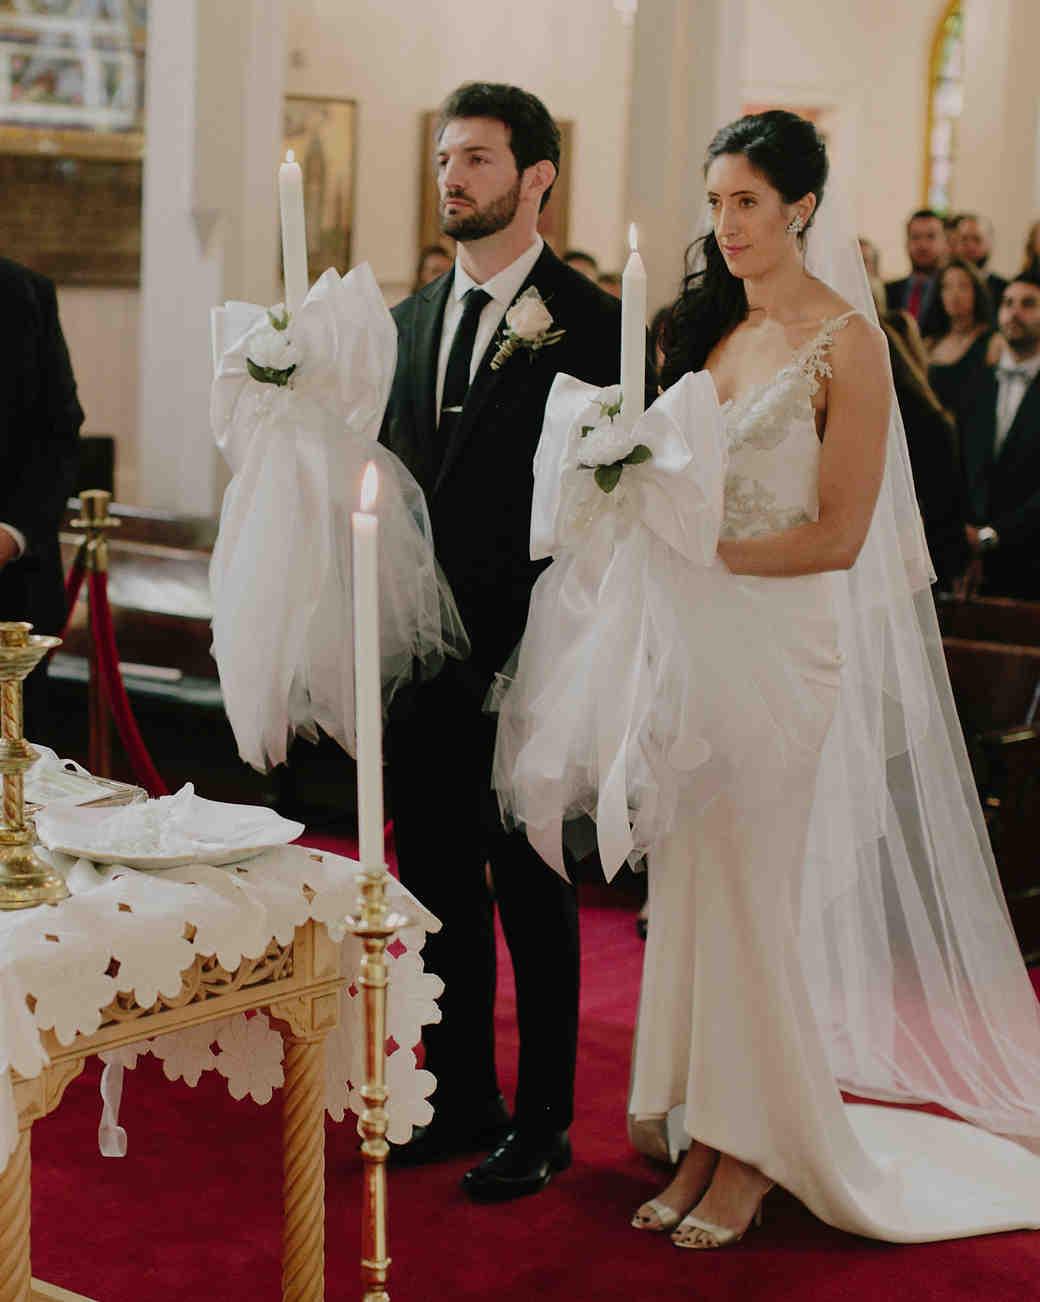 rosie-constantine-wedding-ceremony-125-s112177-1015.jpg